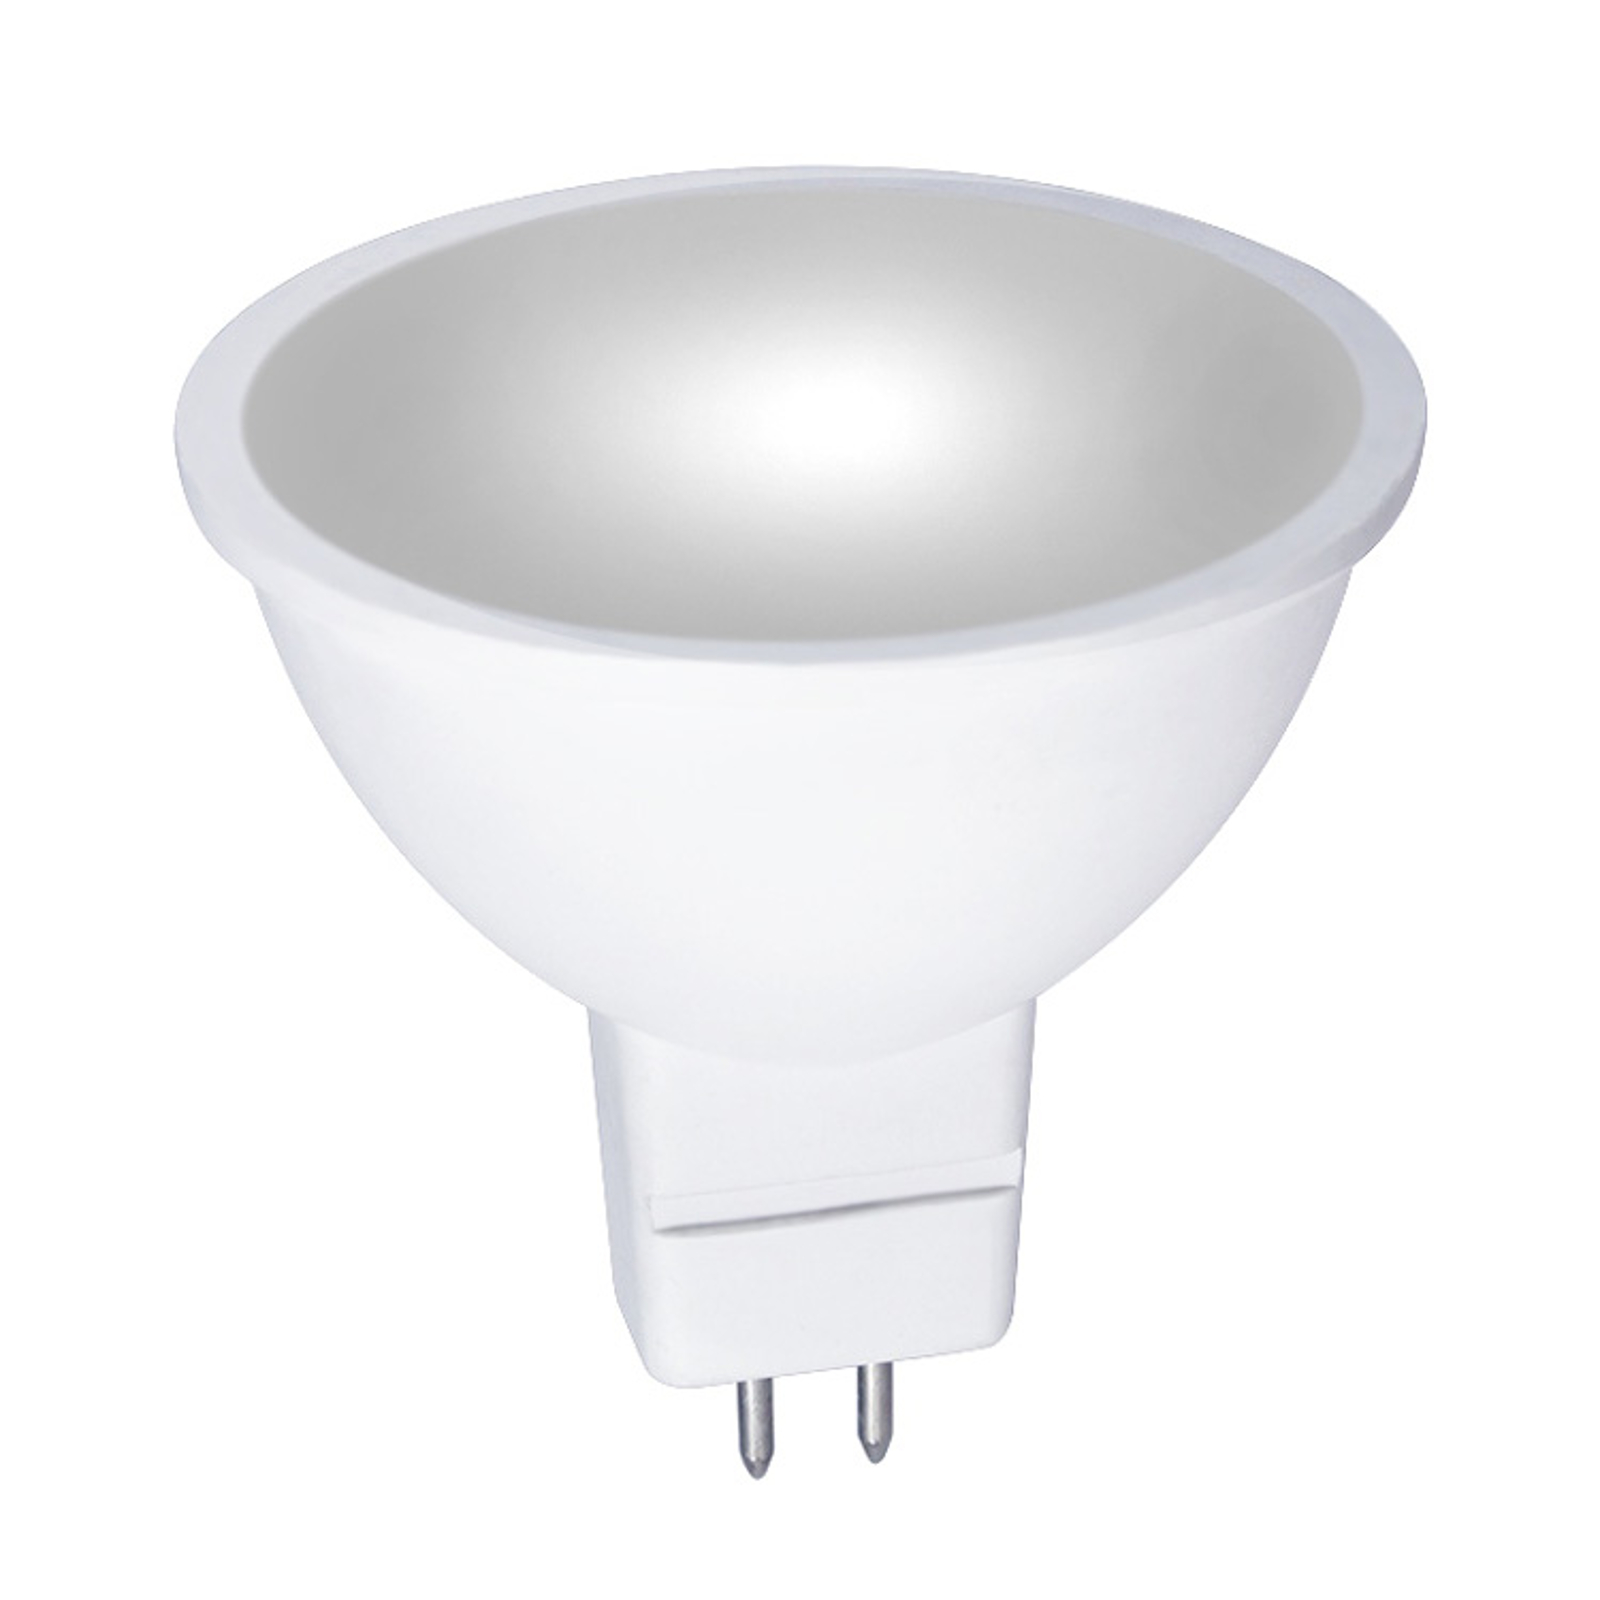 Reflektor LED KADO GU5,3 7W 3000K